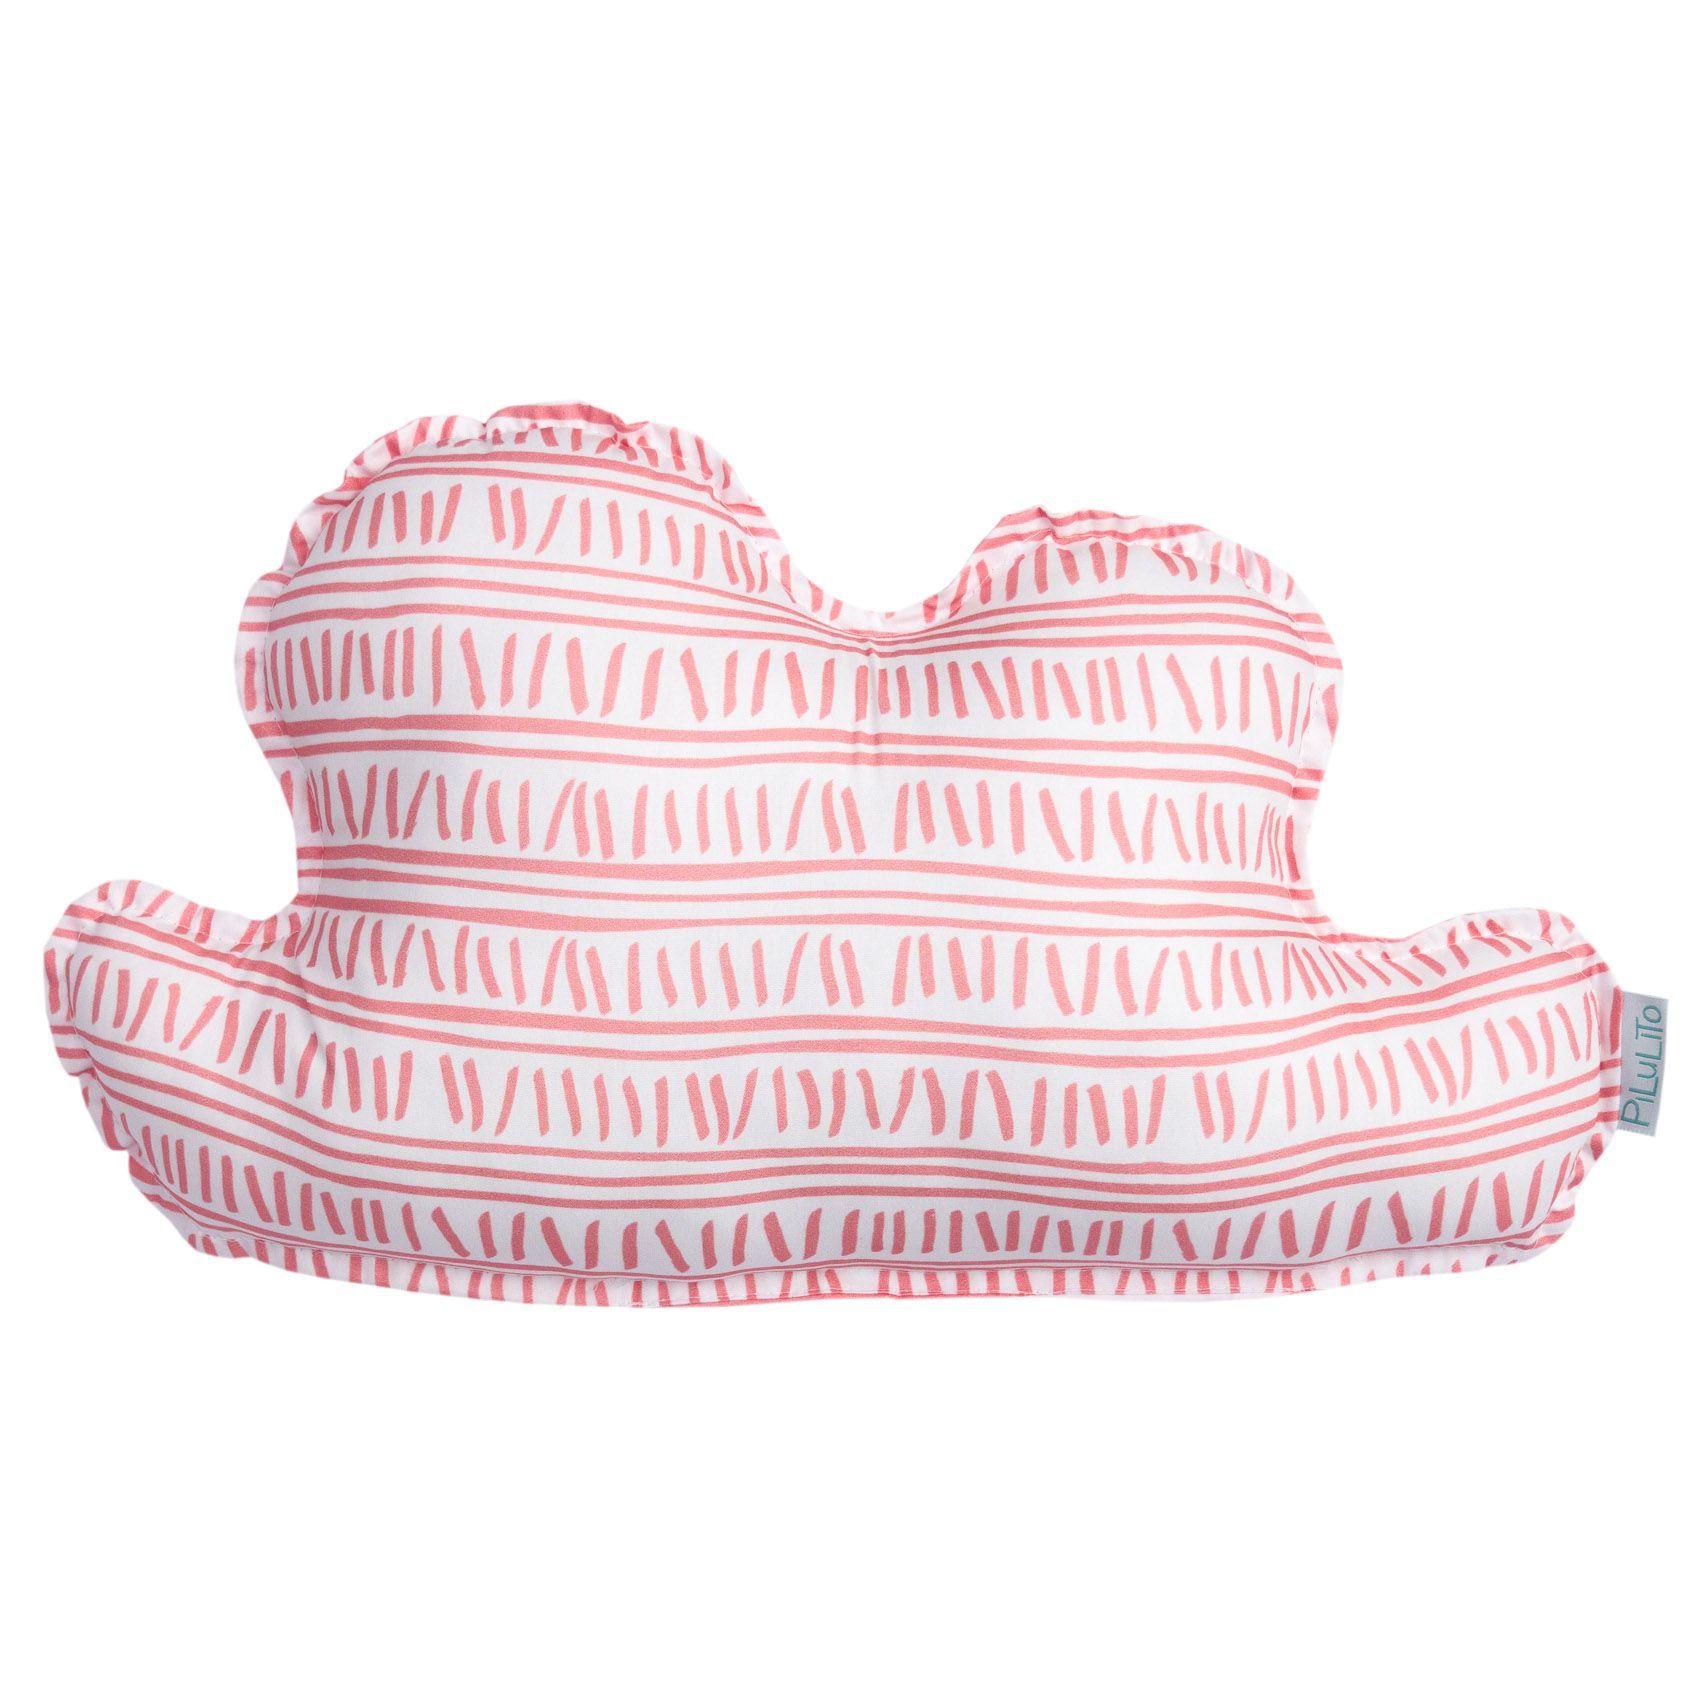 Almofada nuvem pequena trilha rosa